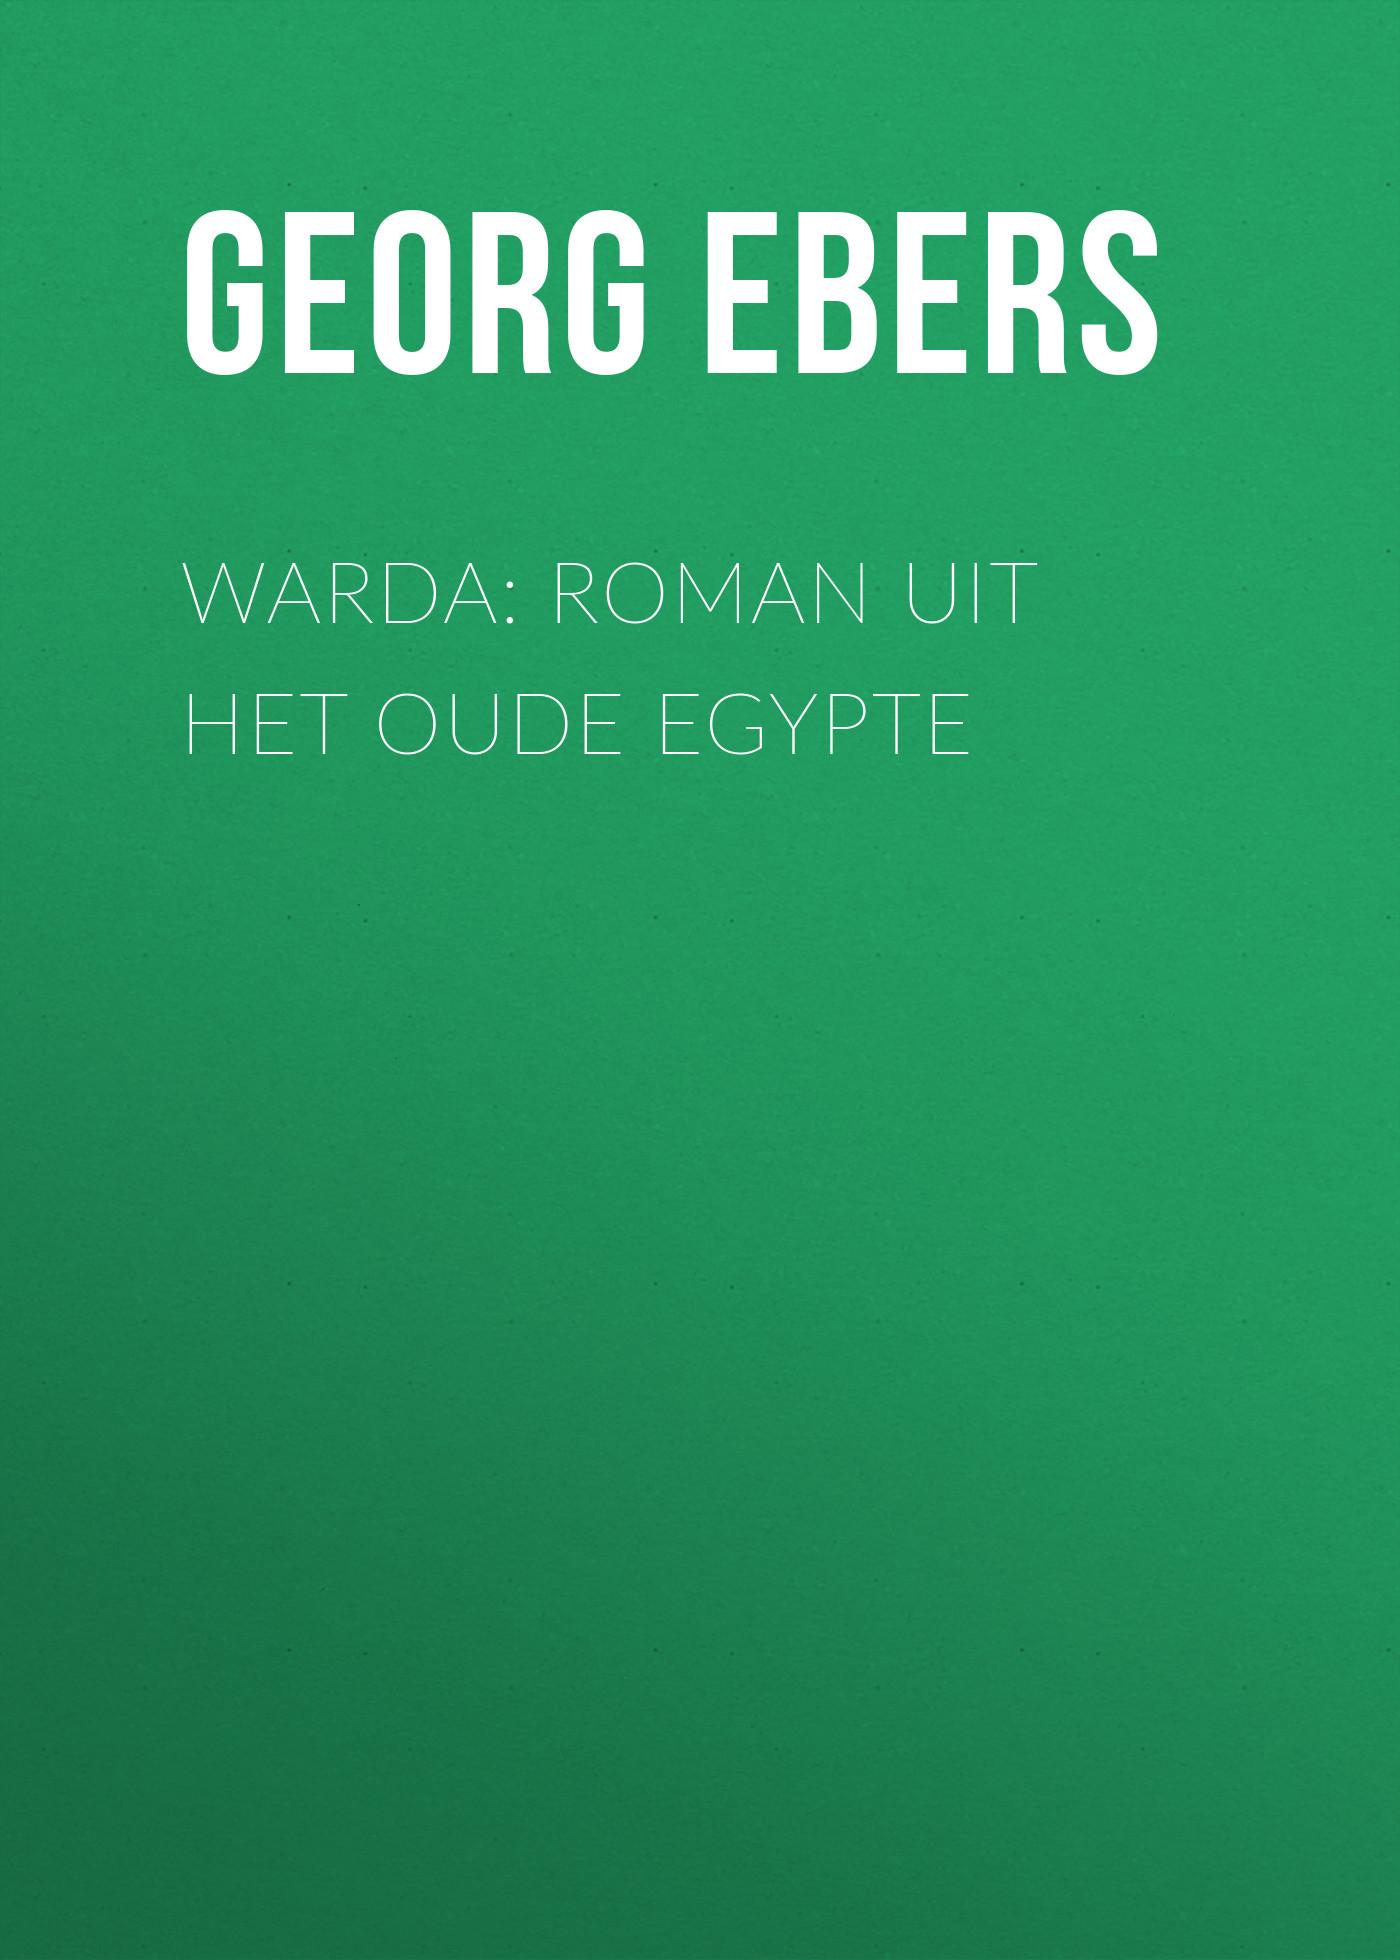 Georg Ebers Warda: Roman uit het oude Egypte georg ebers de nijlbruid